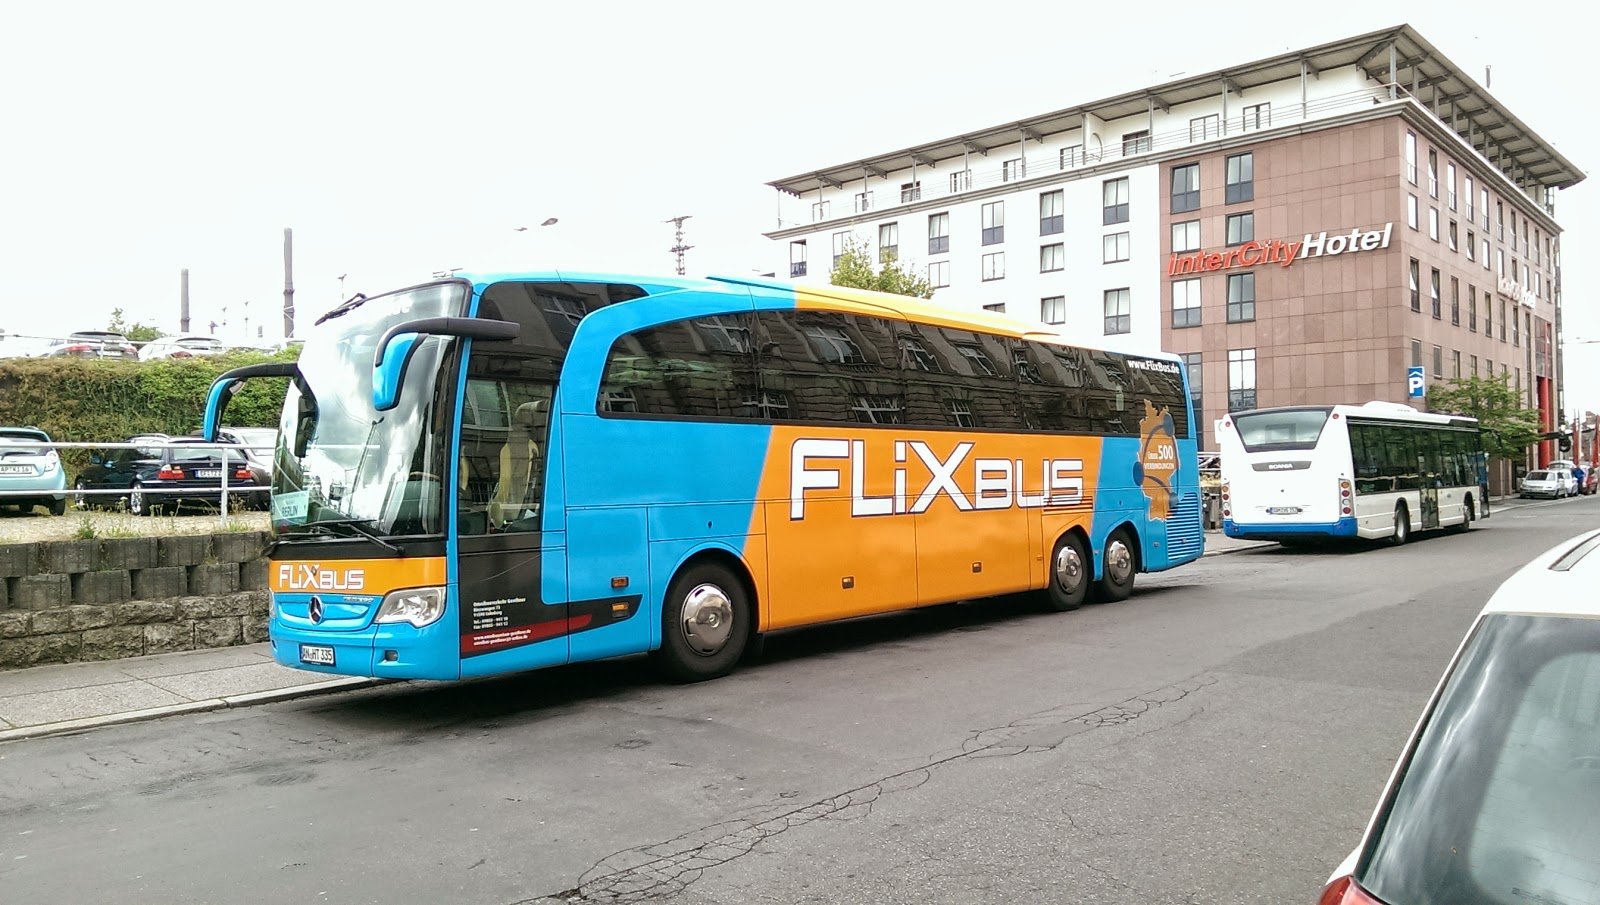 berlin verkehrs presseschau und informationen fernbus fernbusse ab berlin fahren nun auch. Black Bedroom Furniture Sets. Home Design Ideas